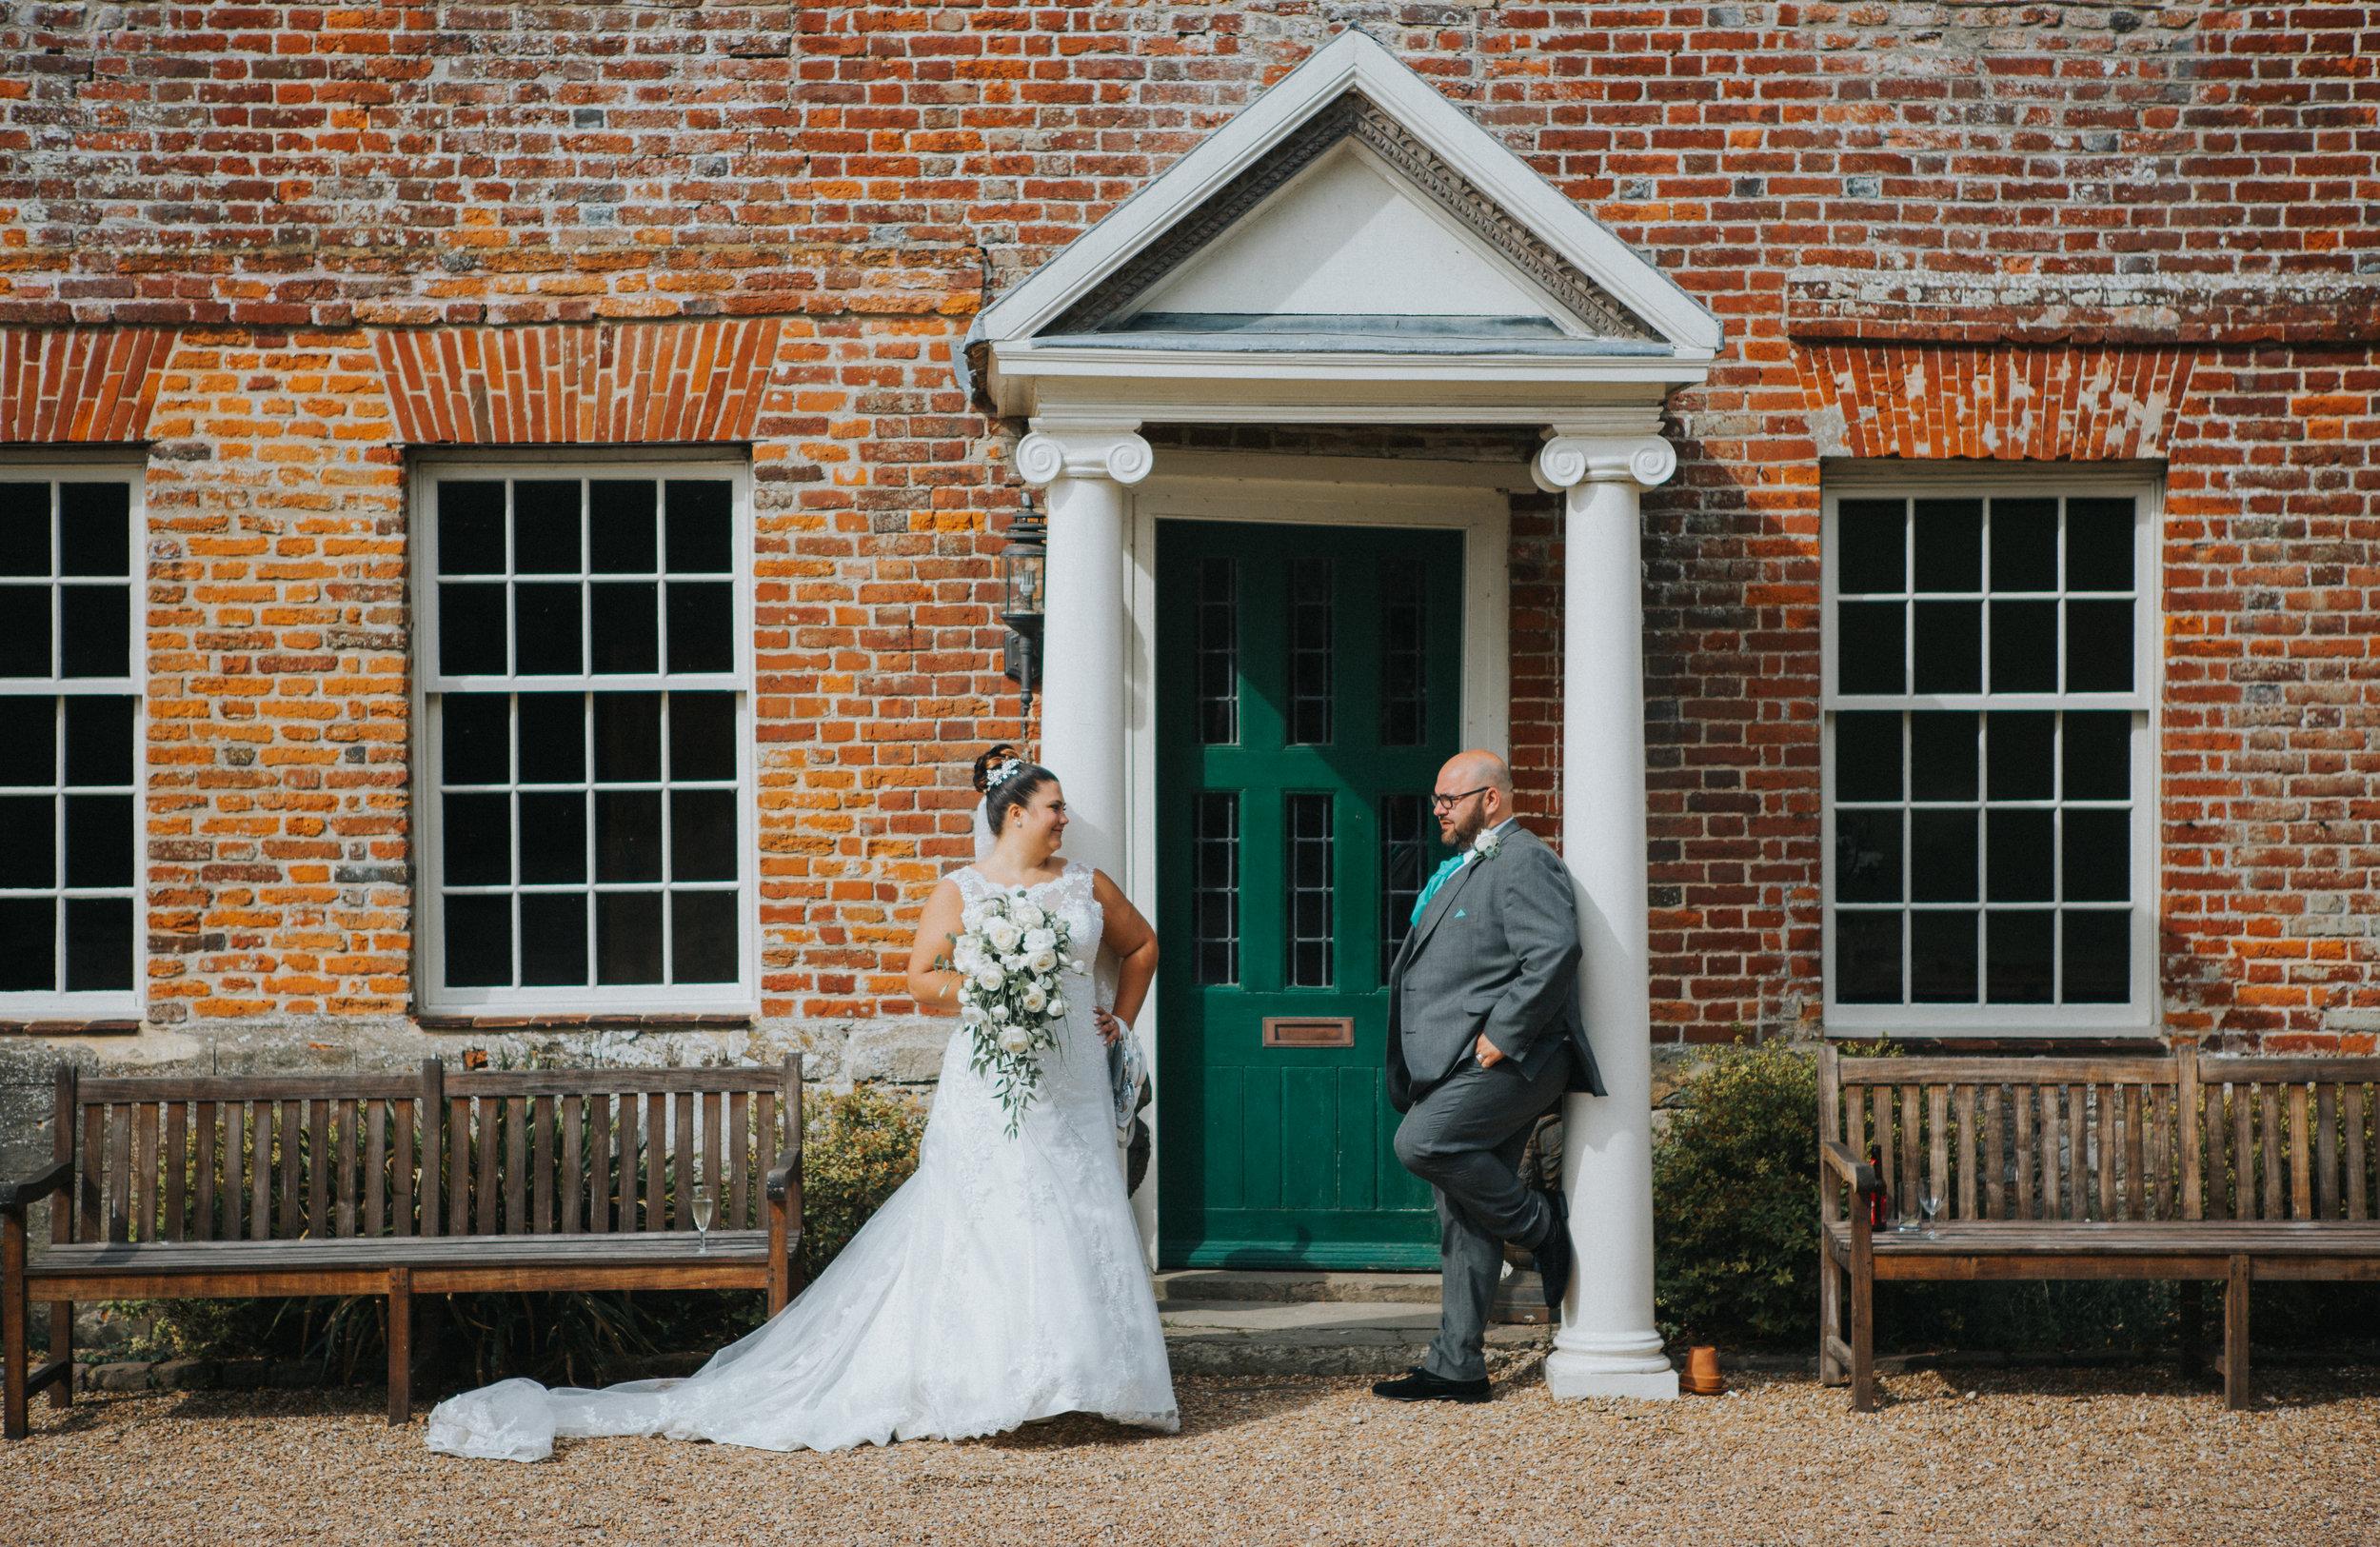 westenhangar-castle-kent-london-wedding-photography-portrait-51